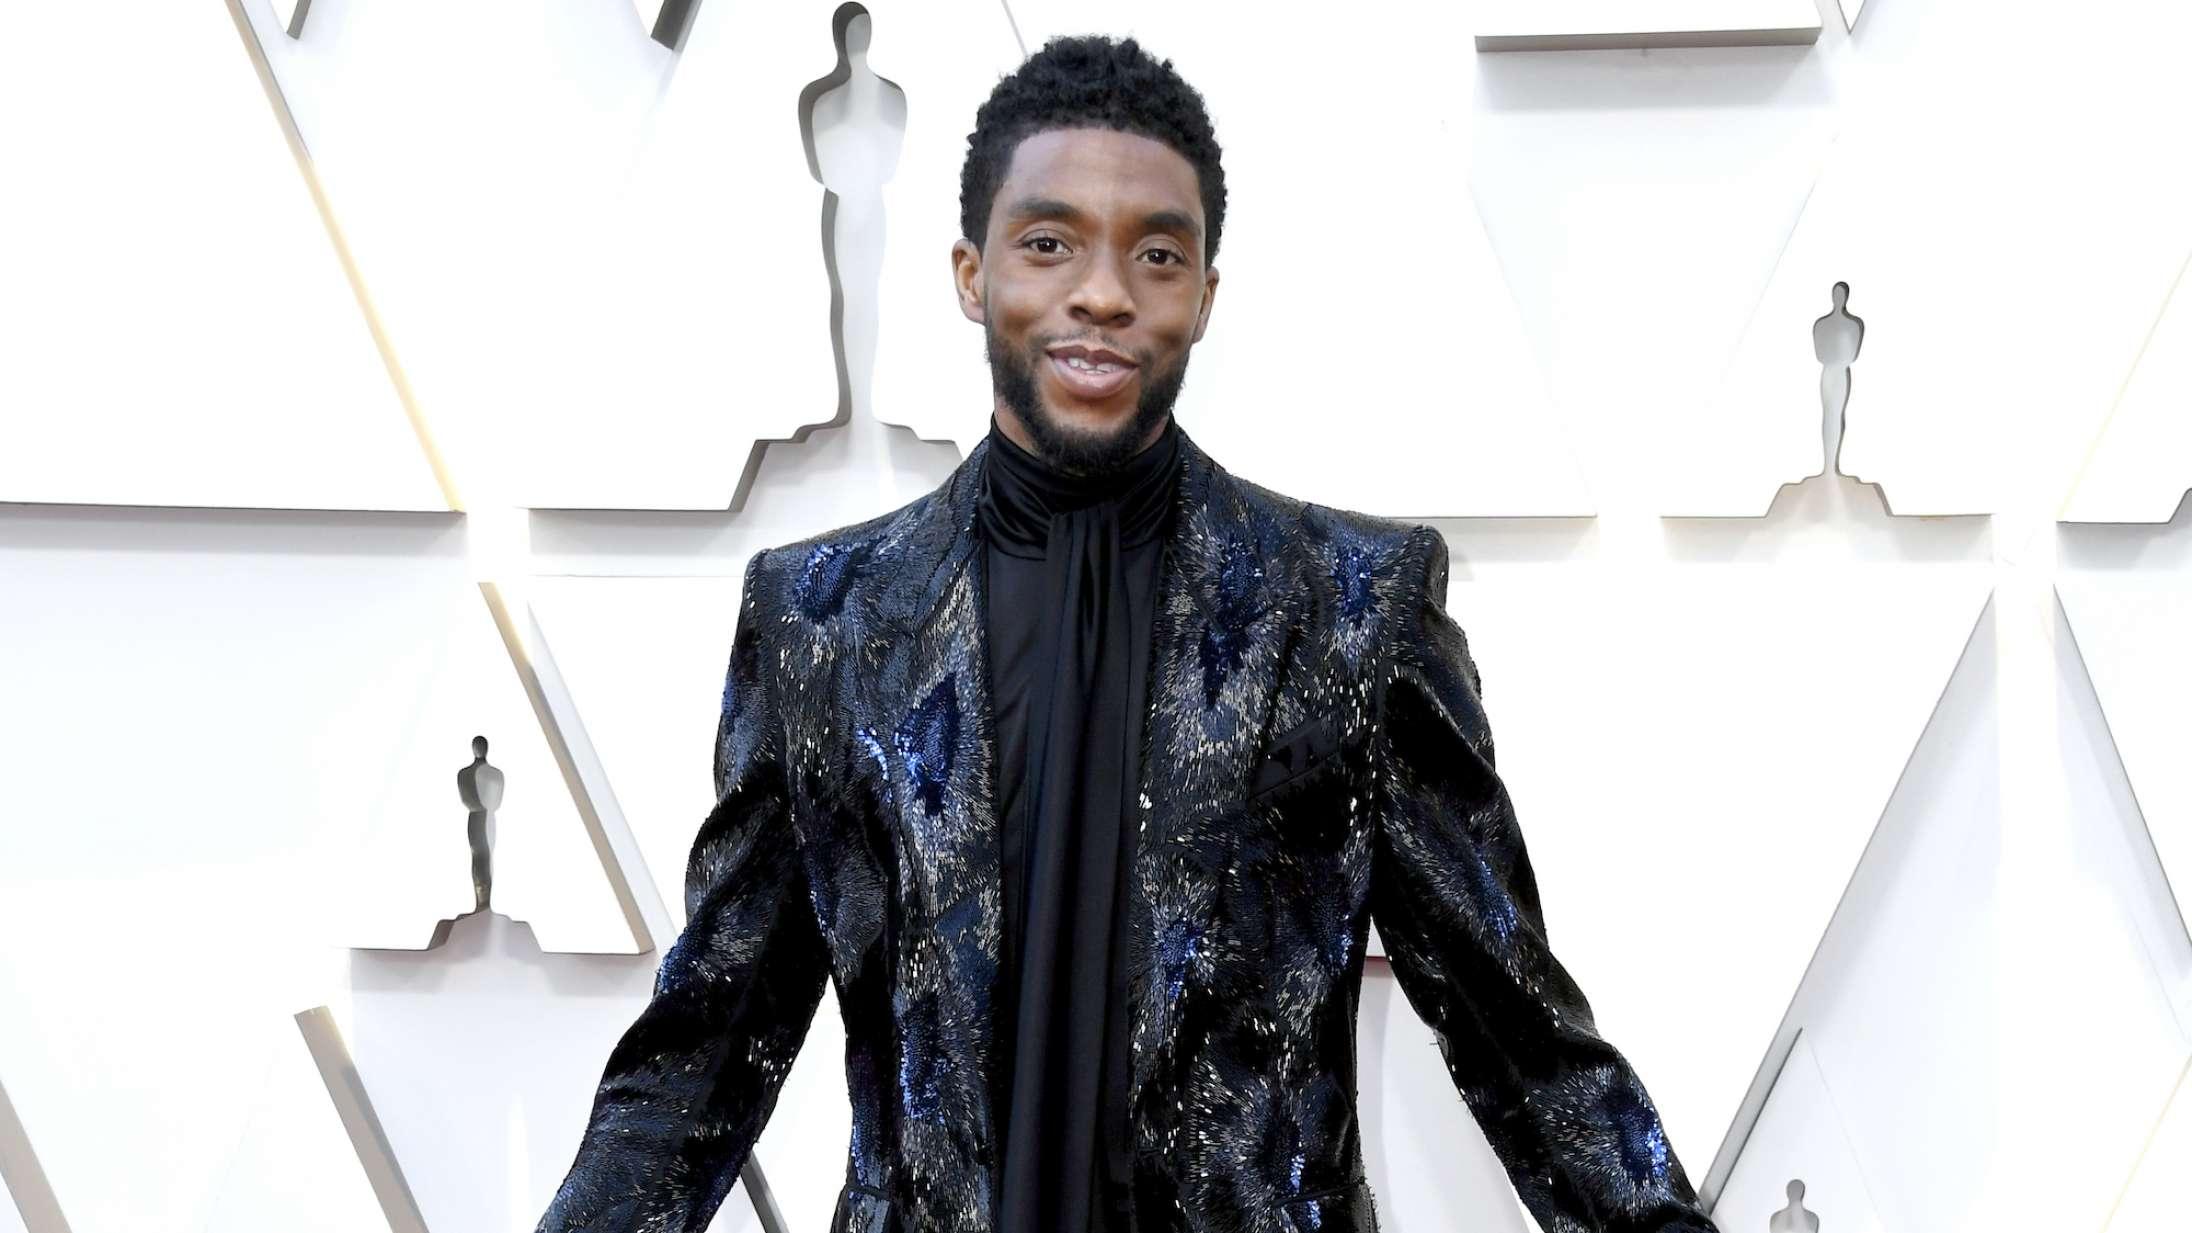 Chadwick Bosemans enke leverer rørende takketale  efter Golden Globe-sejr